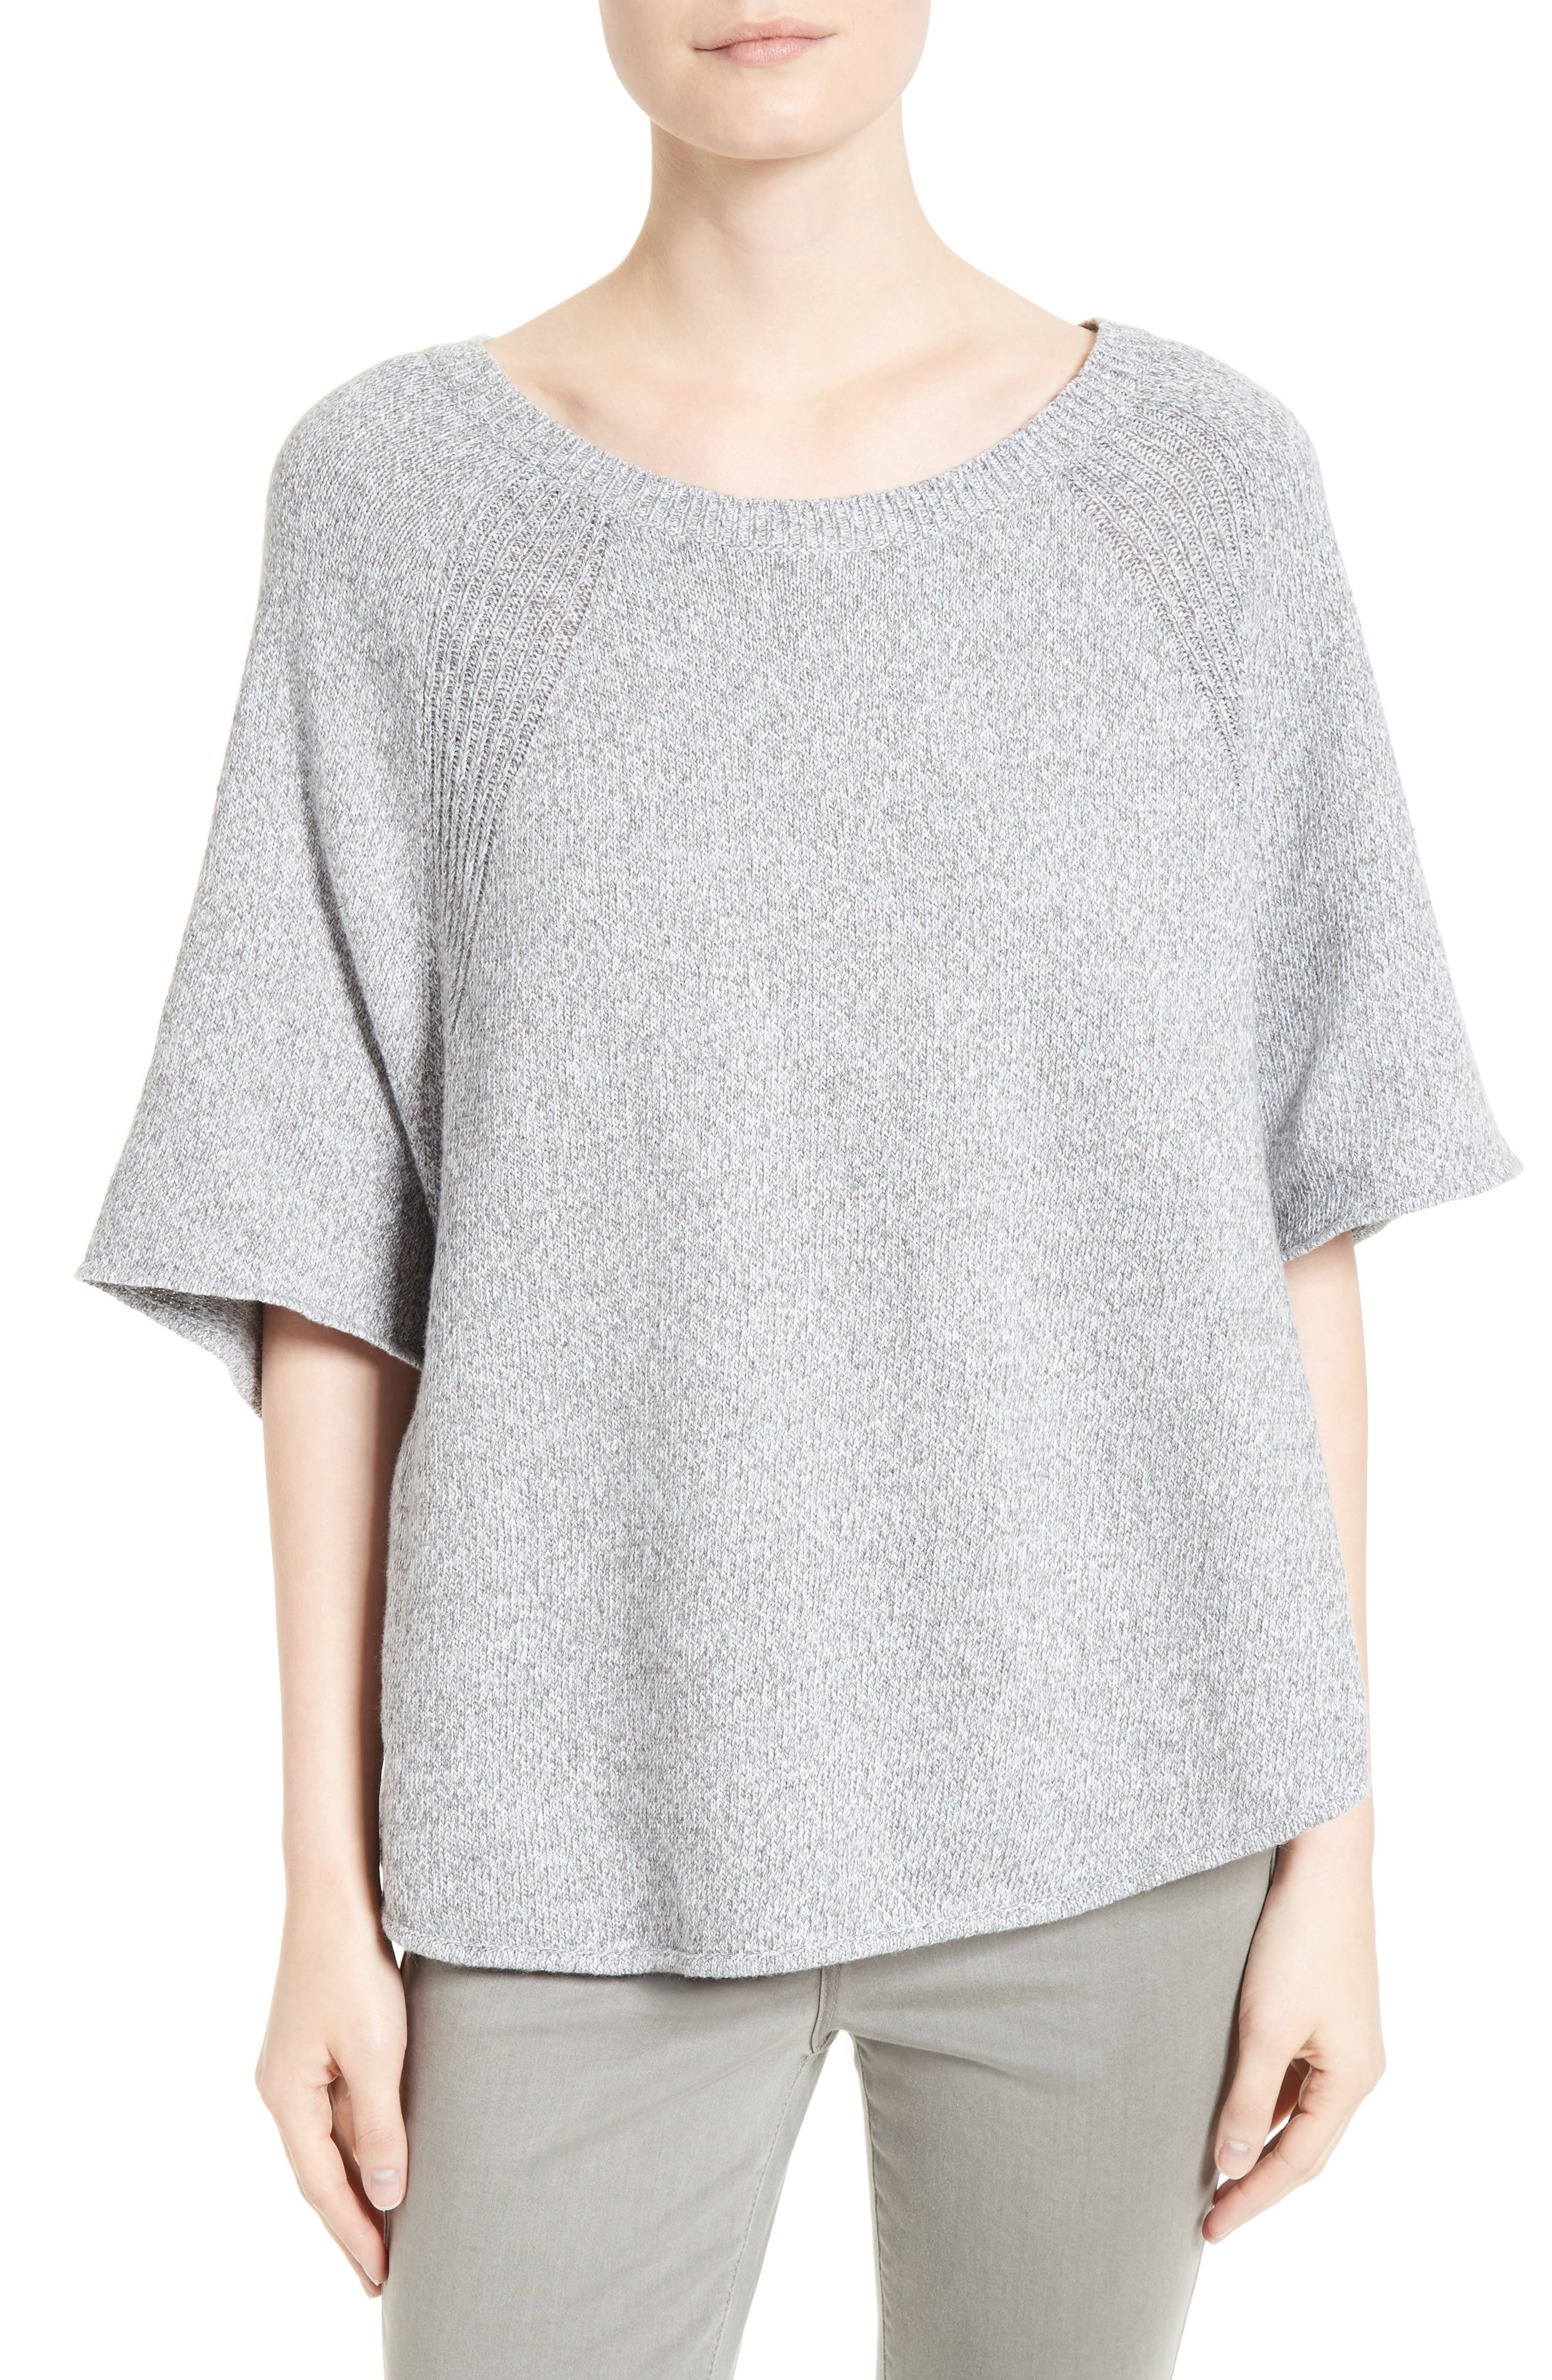 Alternate Image 1 Selected - Joie Jolena B Sweater